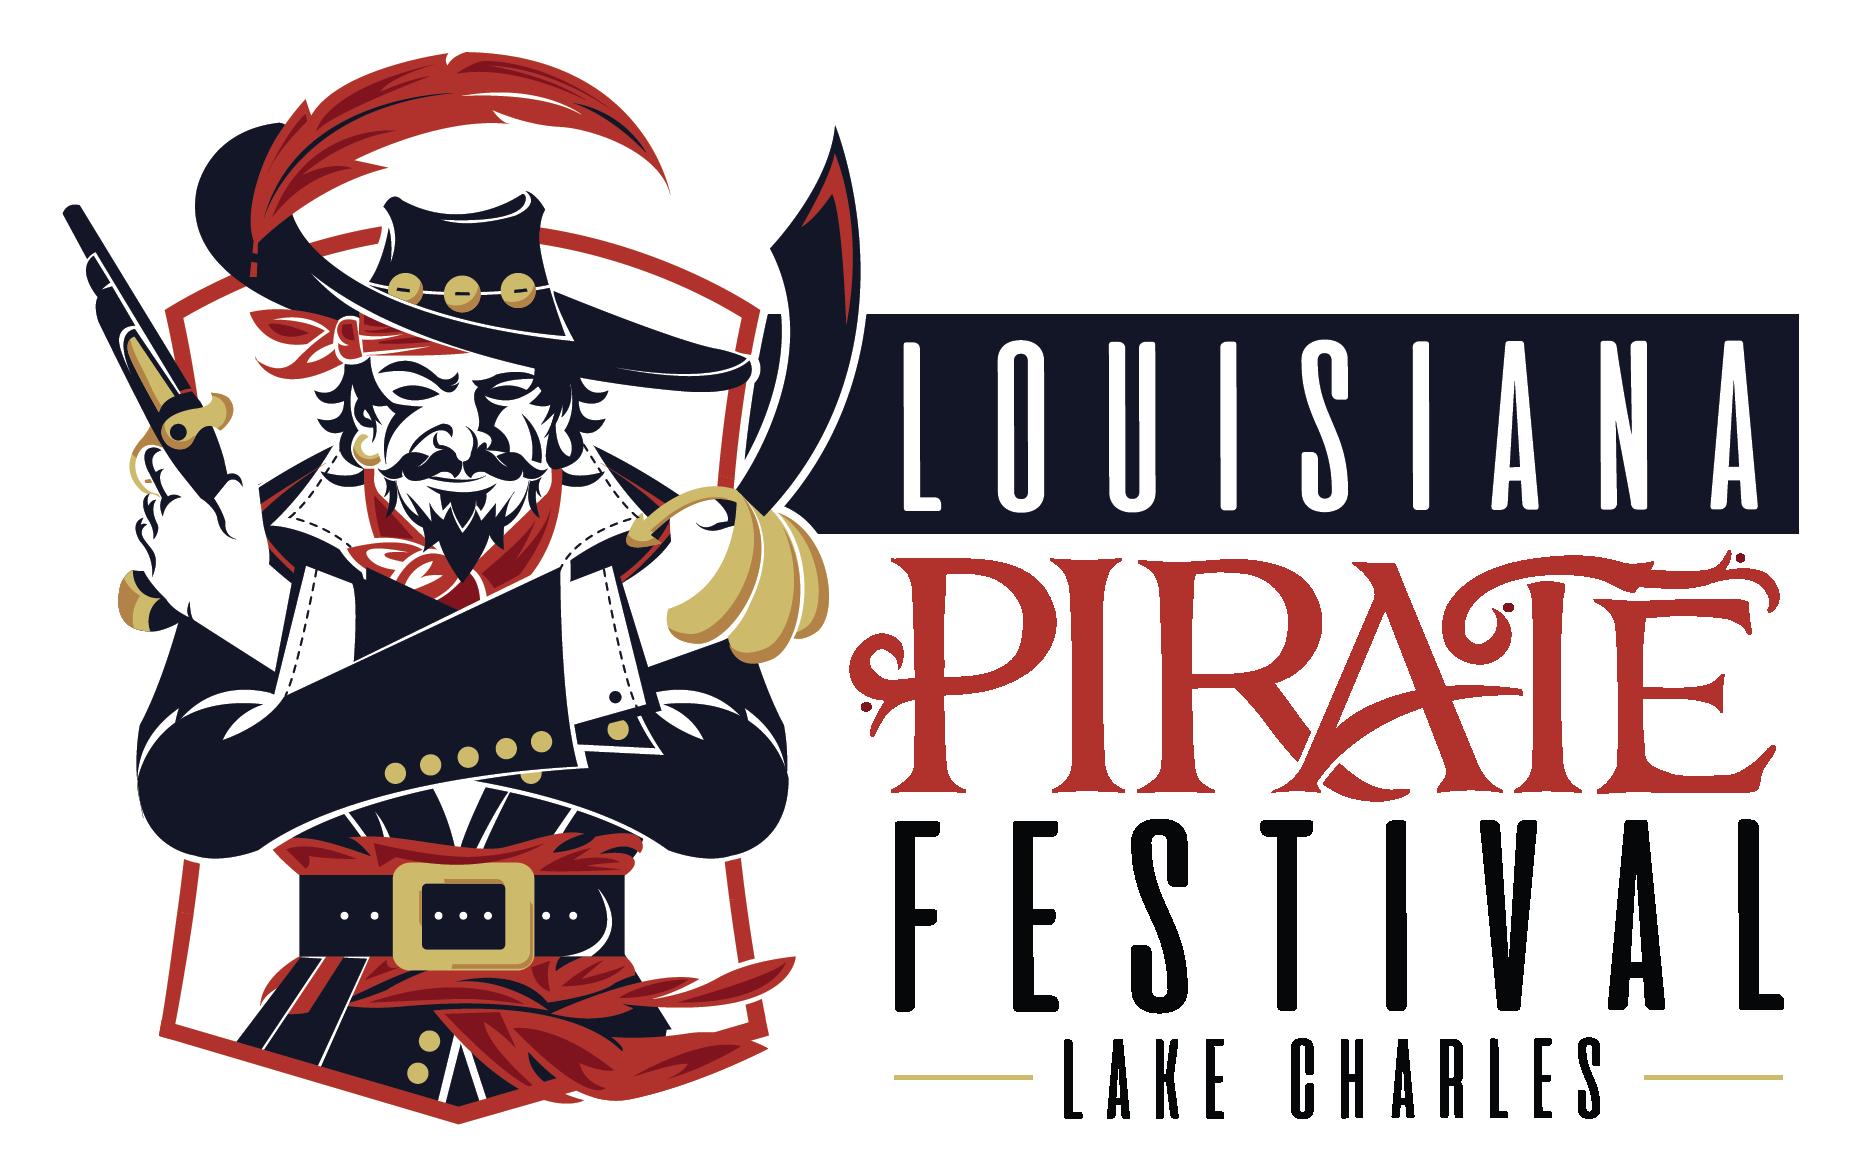 Louisiana clipart festival. Blog pirate in lake